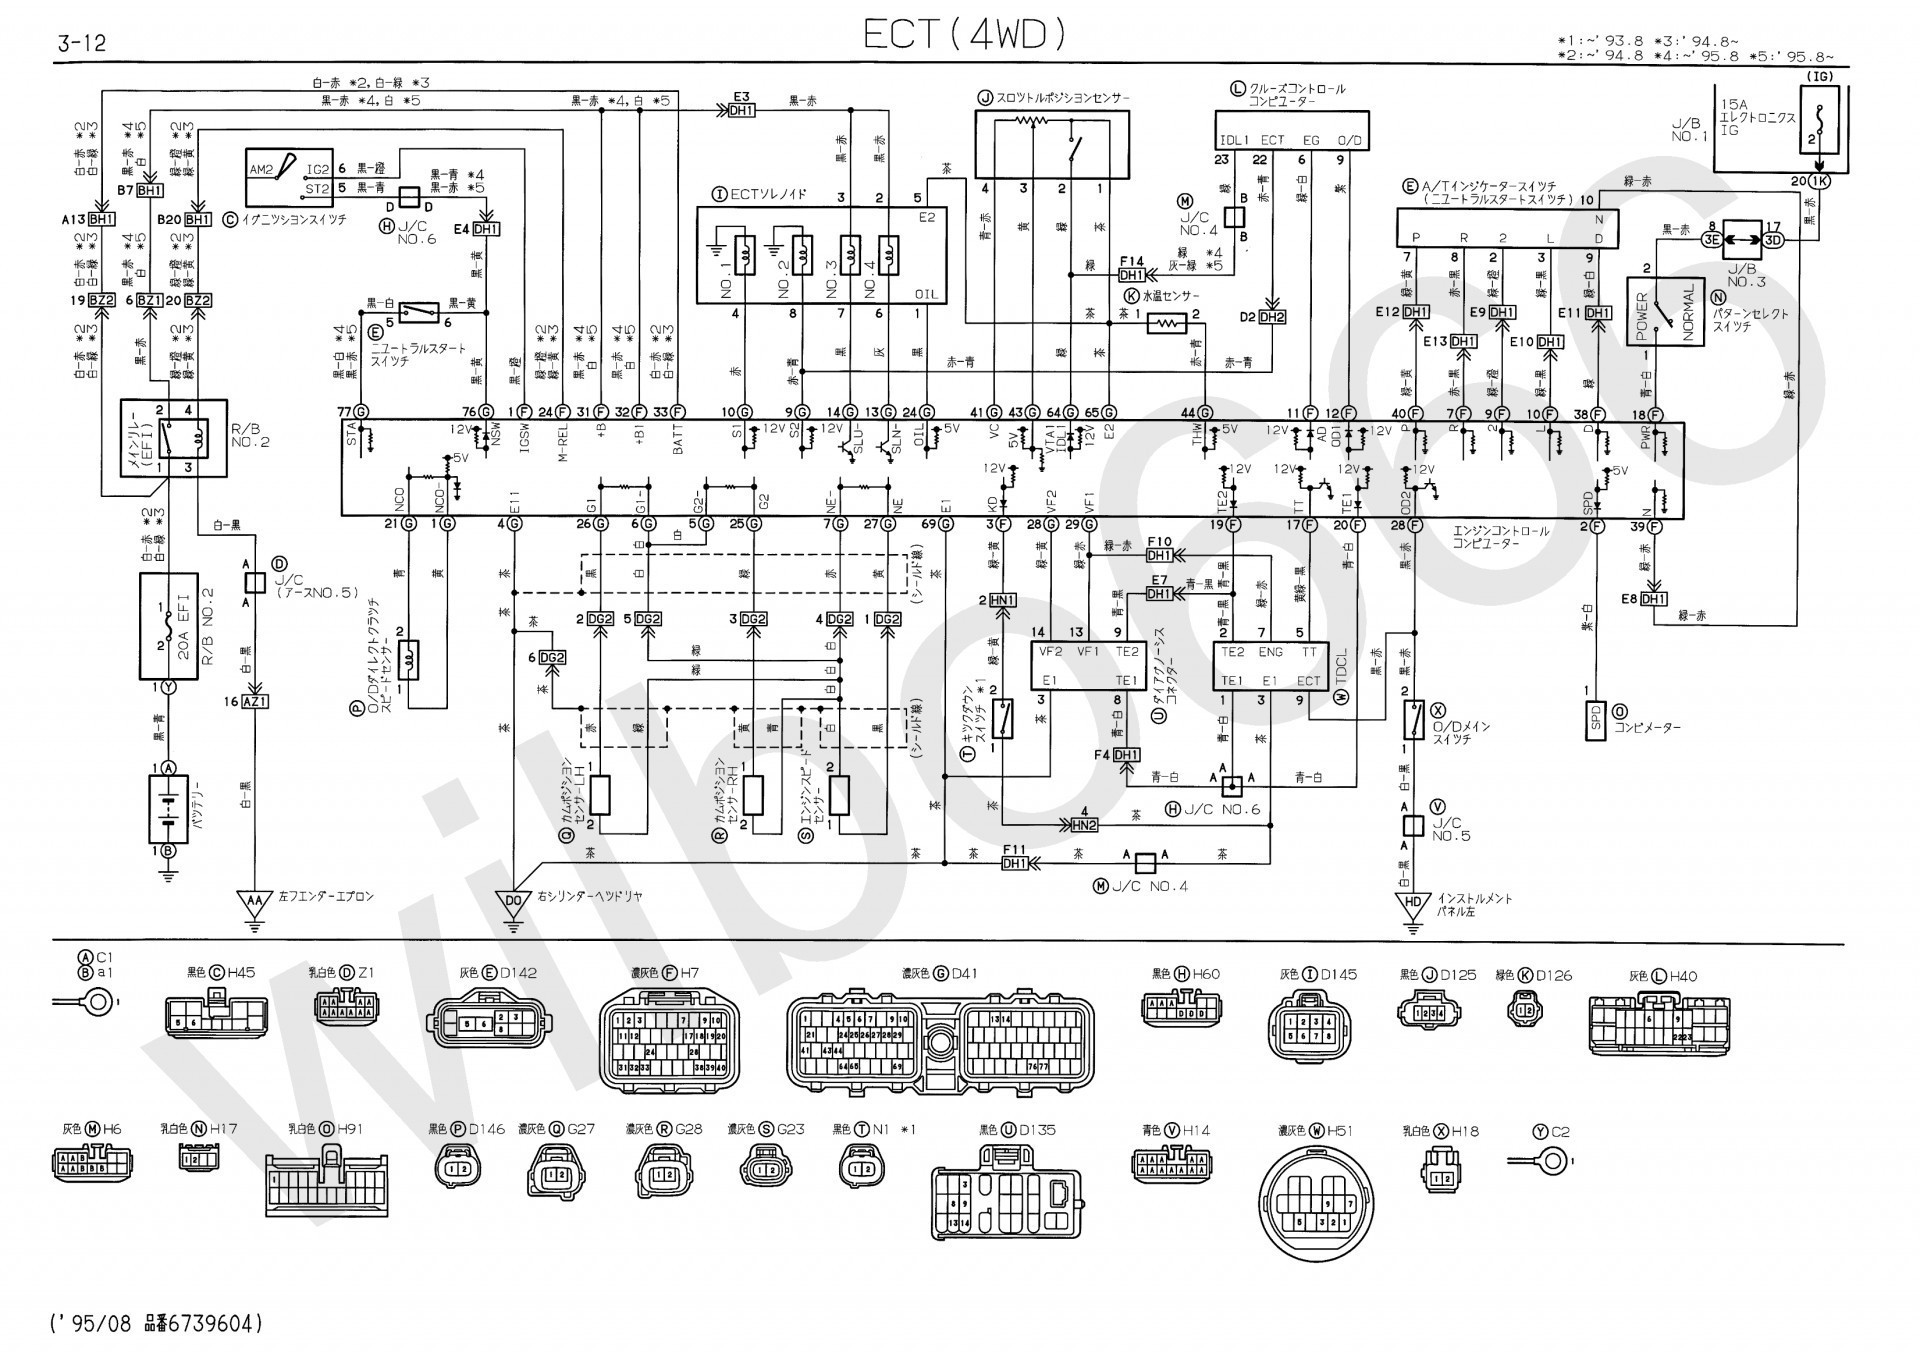 Engine Turbo Diagram Bmw Engine Diagram Beautiful Bmw Twinpower Turbo Engines Explained Of Engine Turbo Diagram